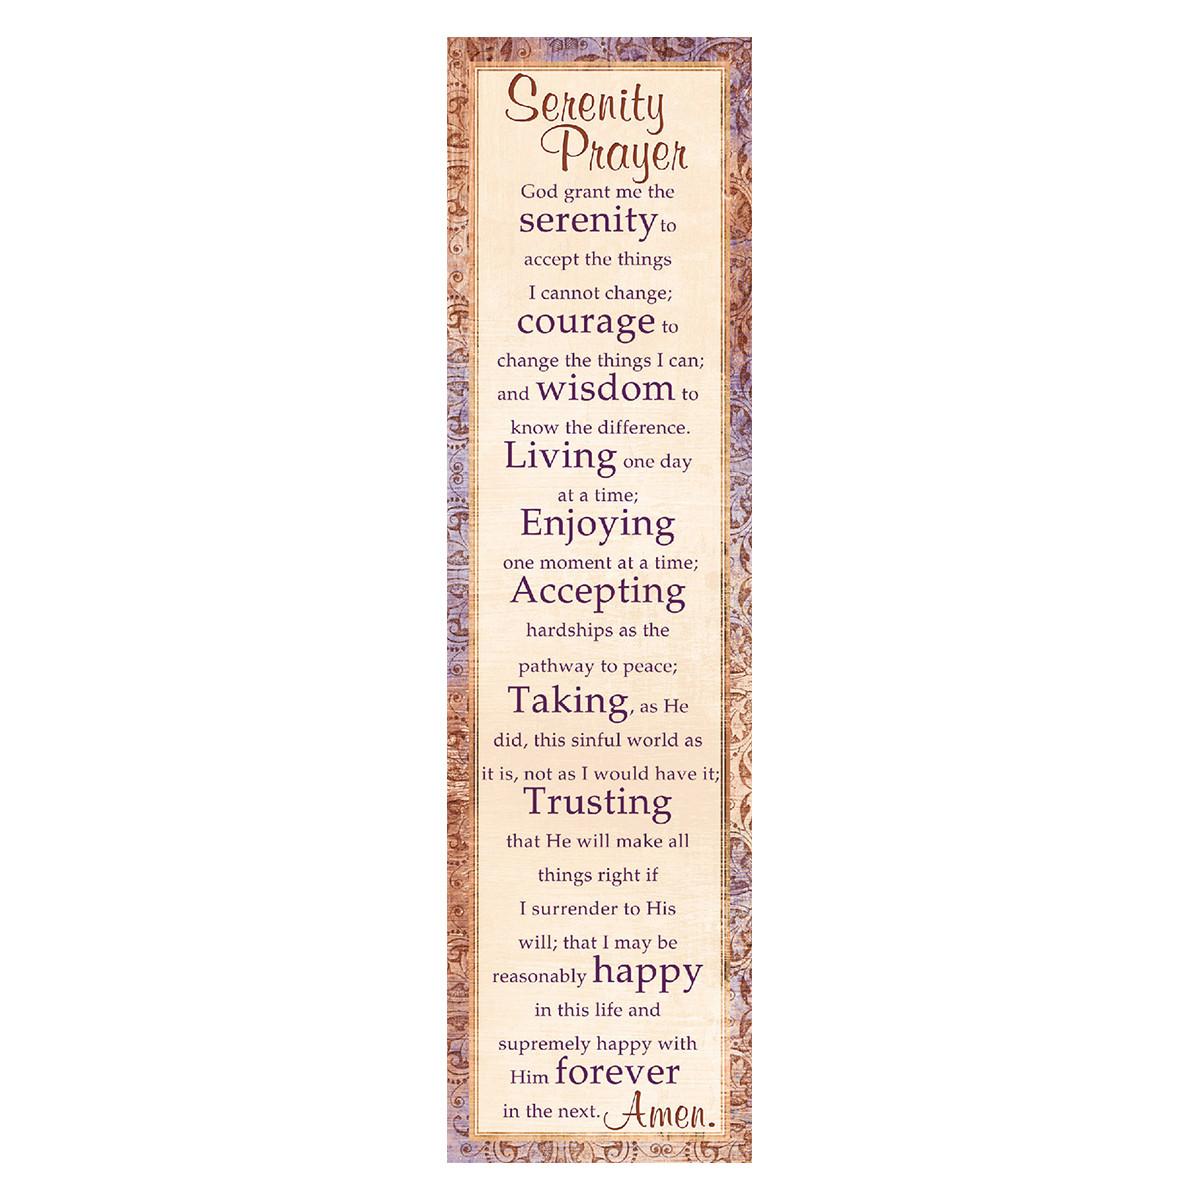 Serenity Prayer Bookmarks